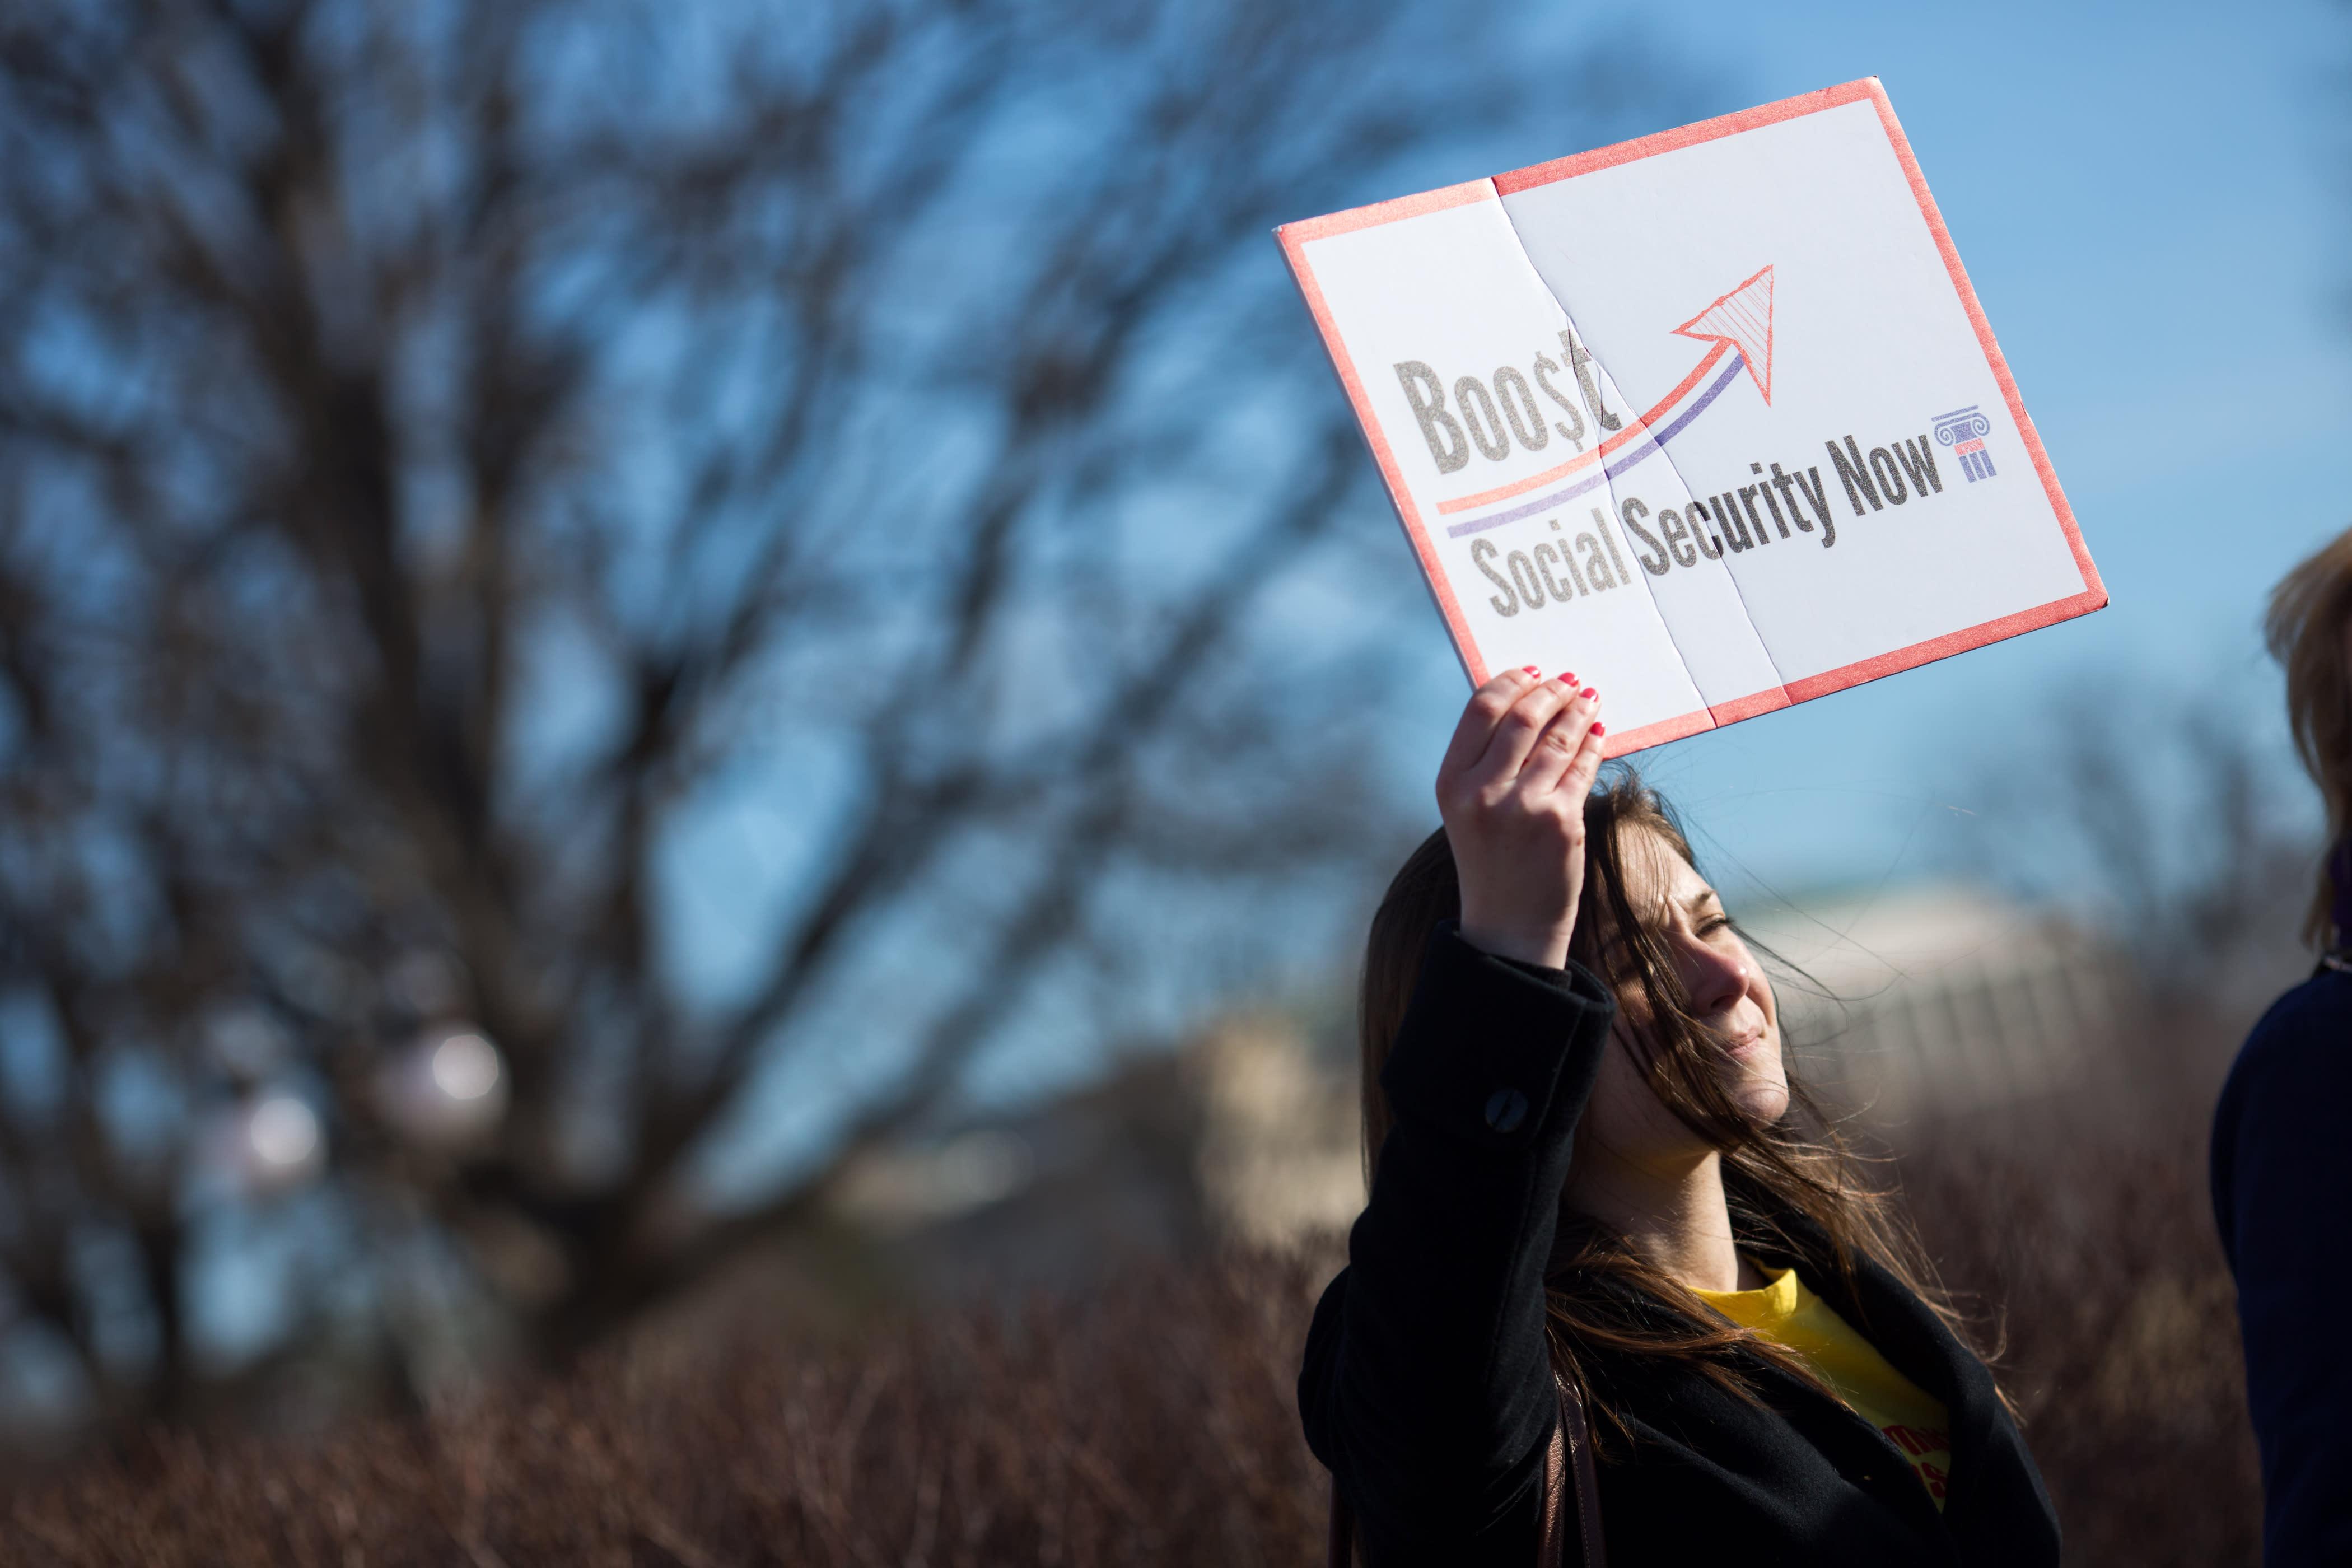 Millennials' financial futures at stake in Social Security reform debate, Republicans say